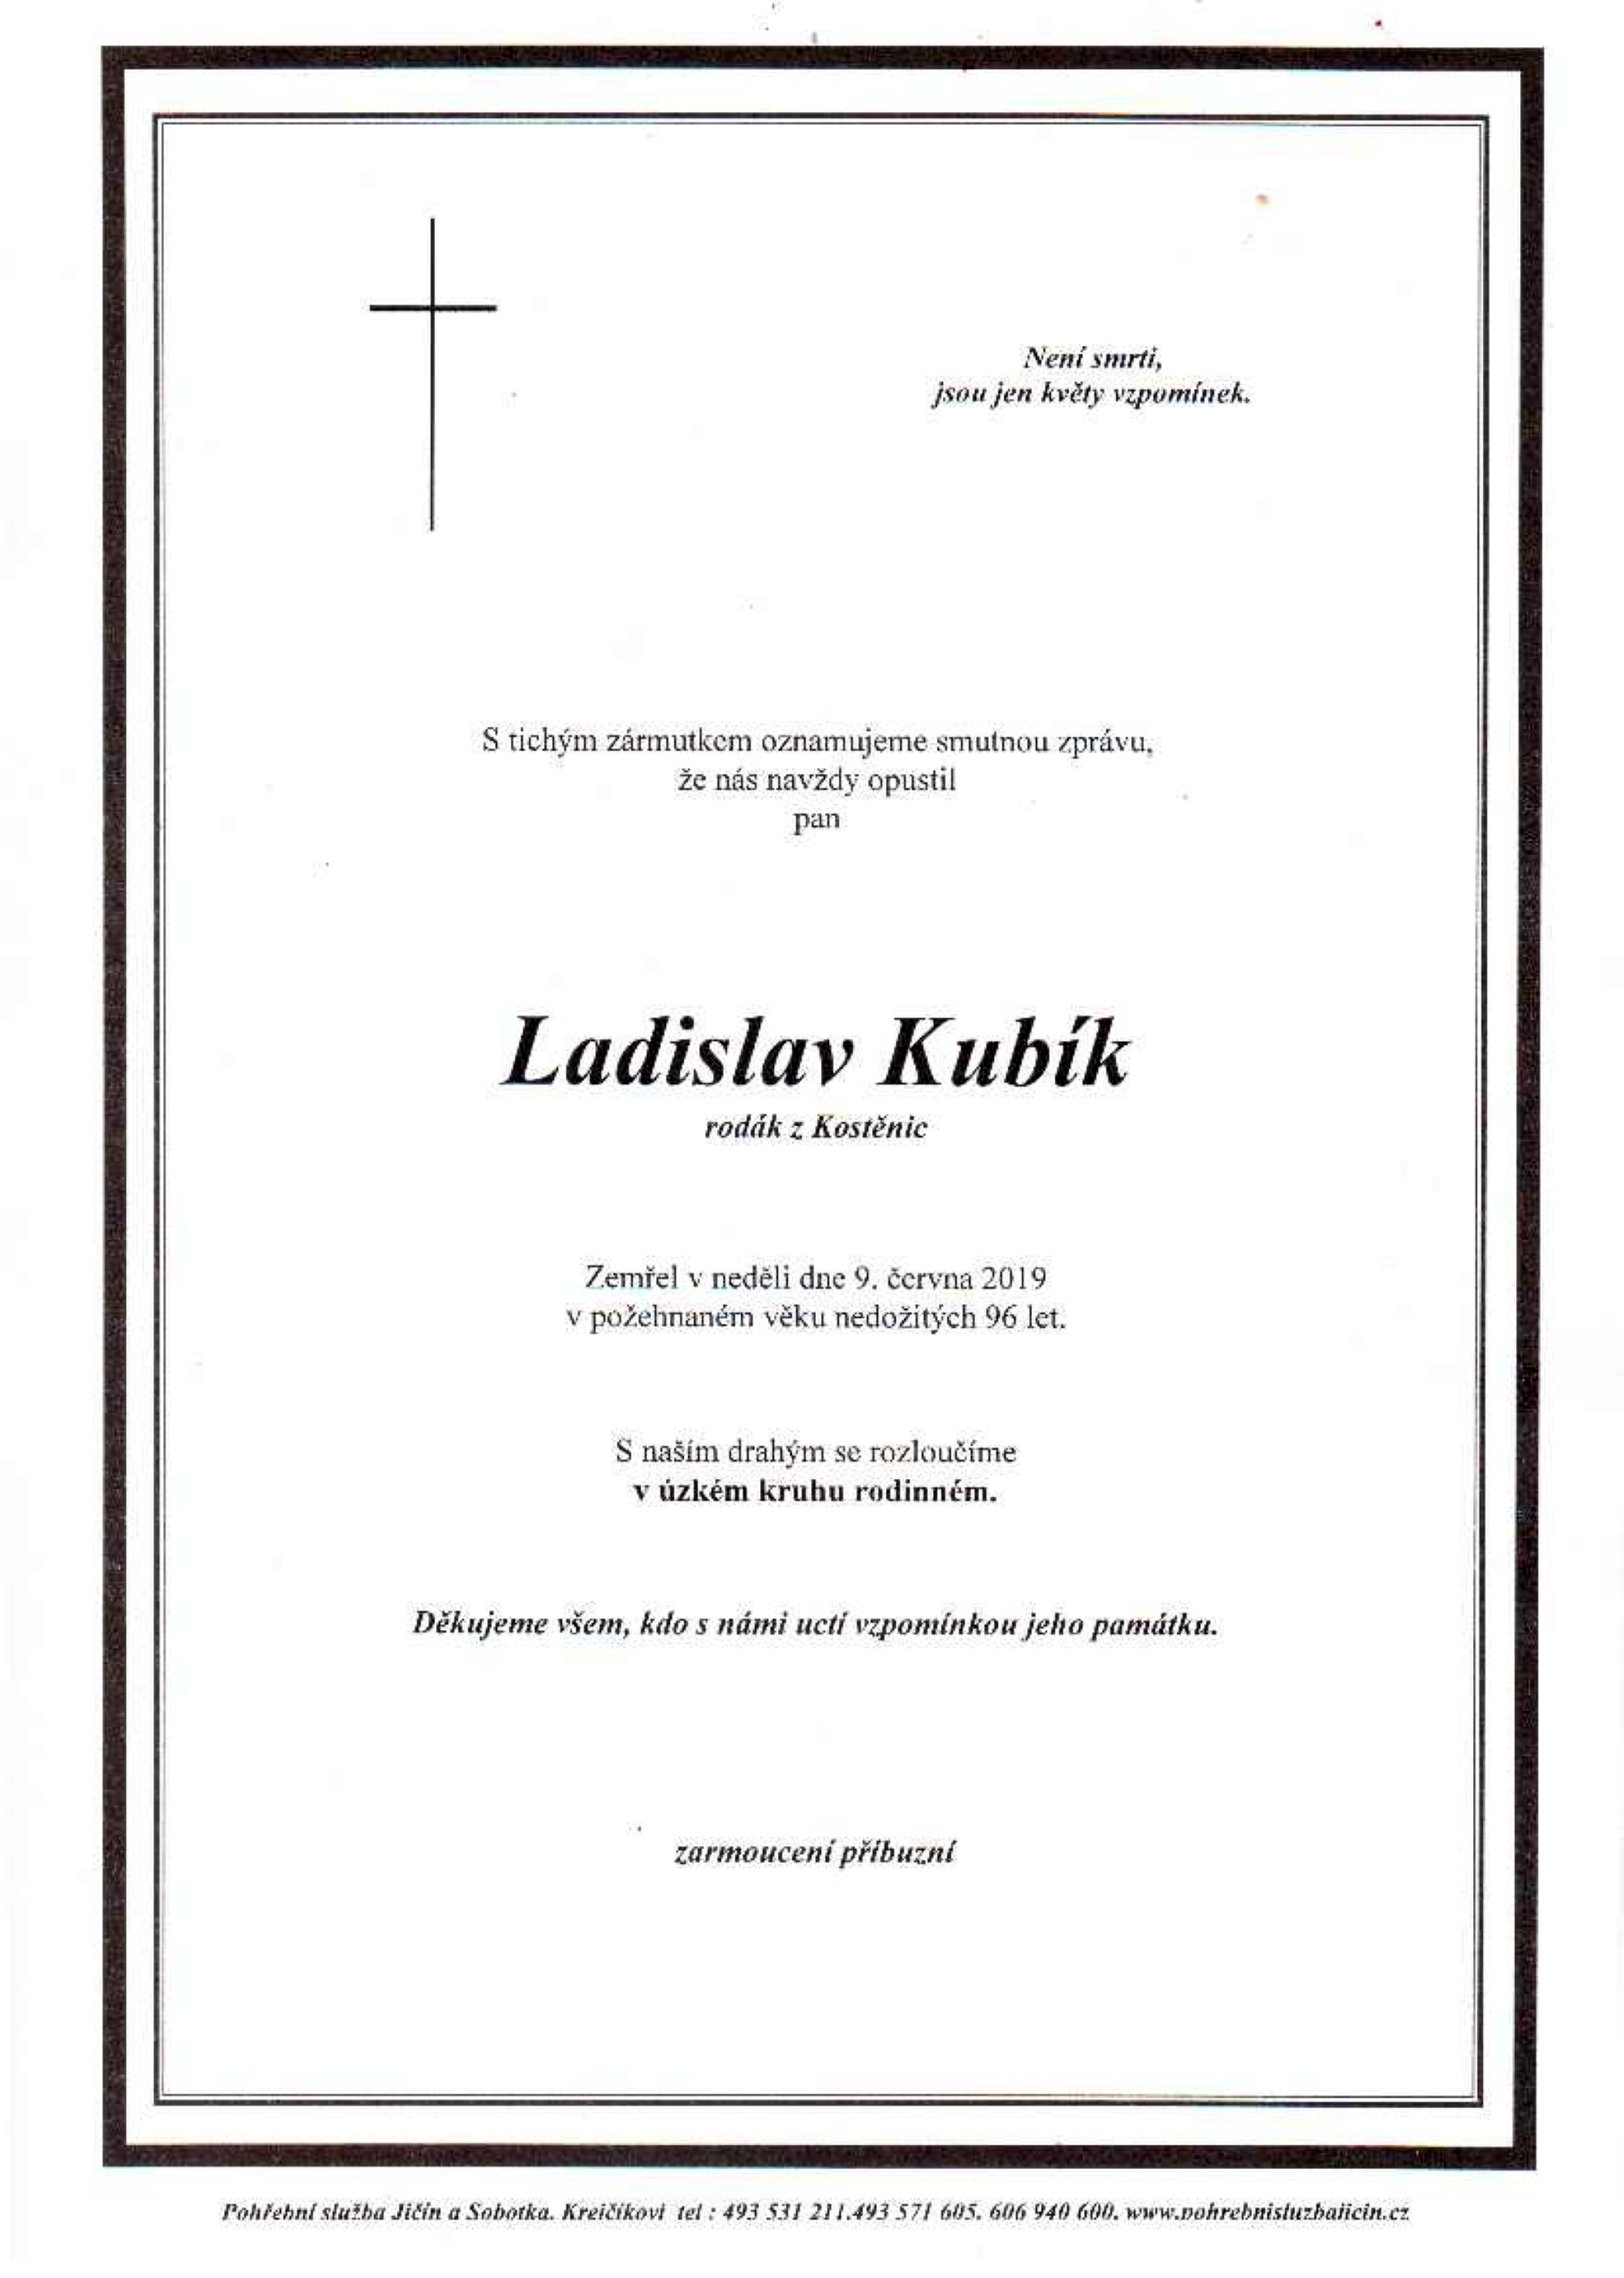 Ladislav Kubík